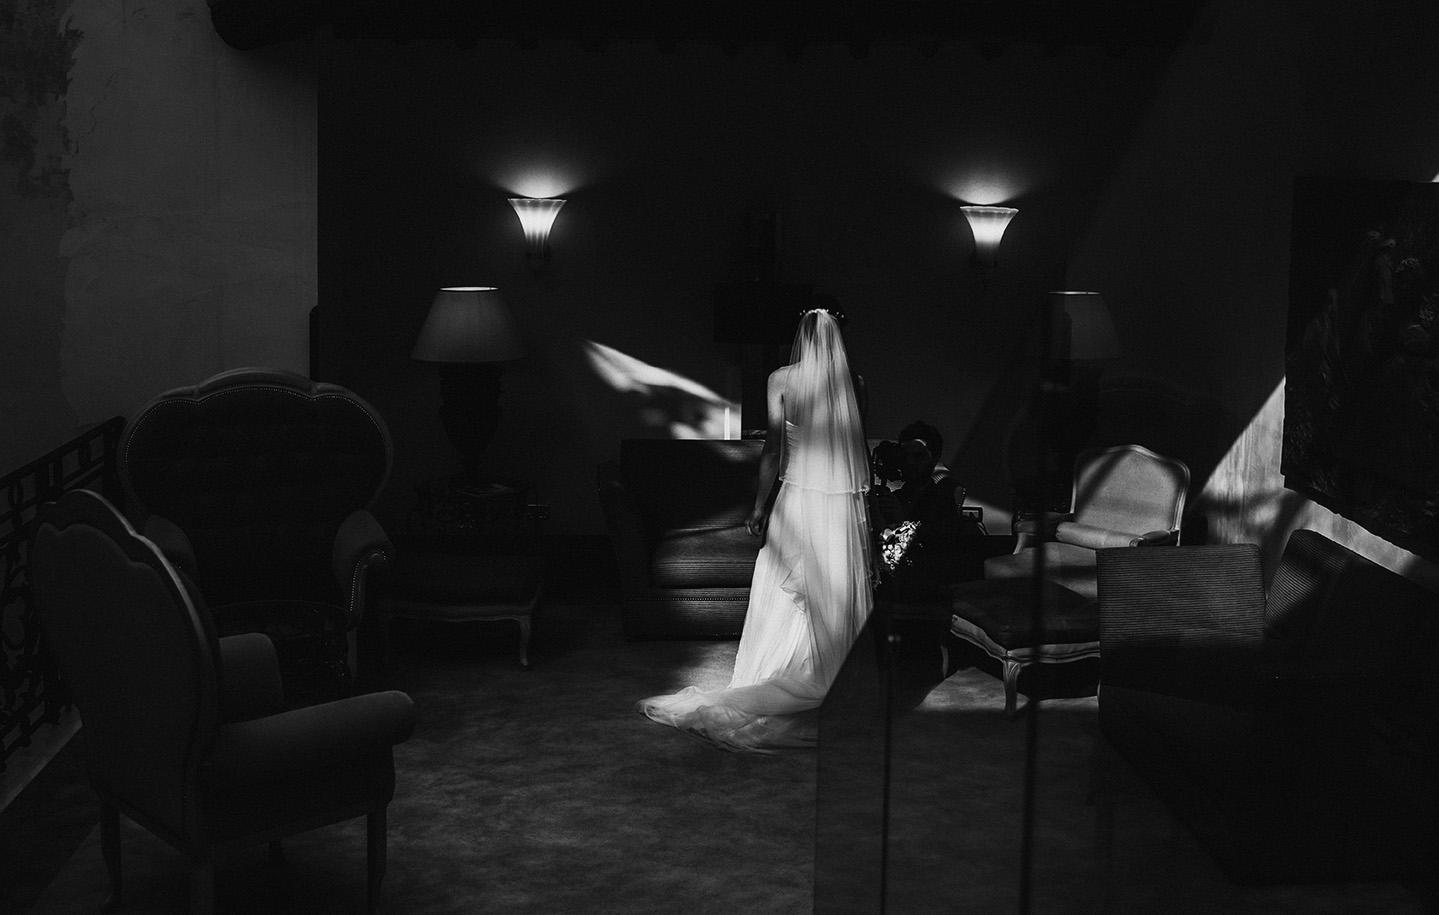 wpj-wedding-photographer-italy